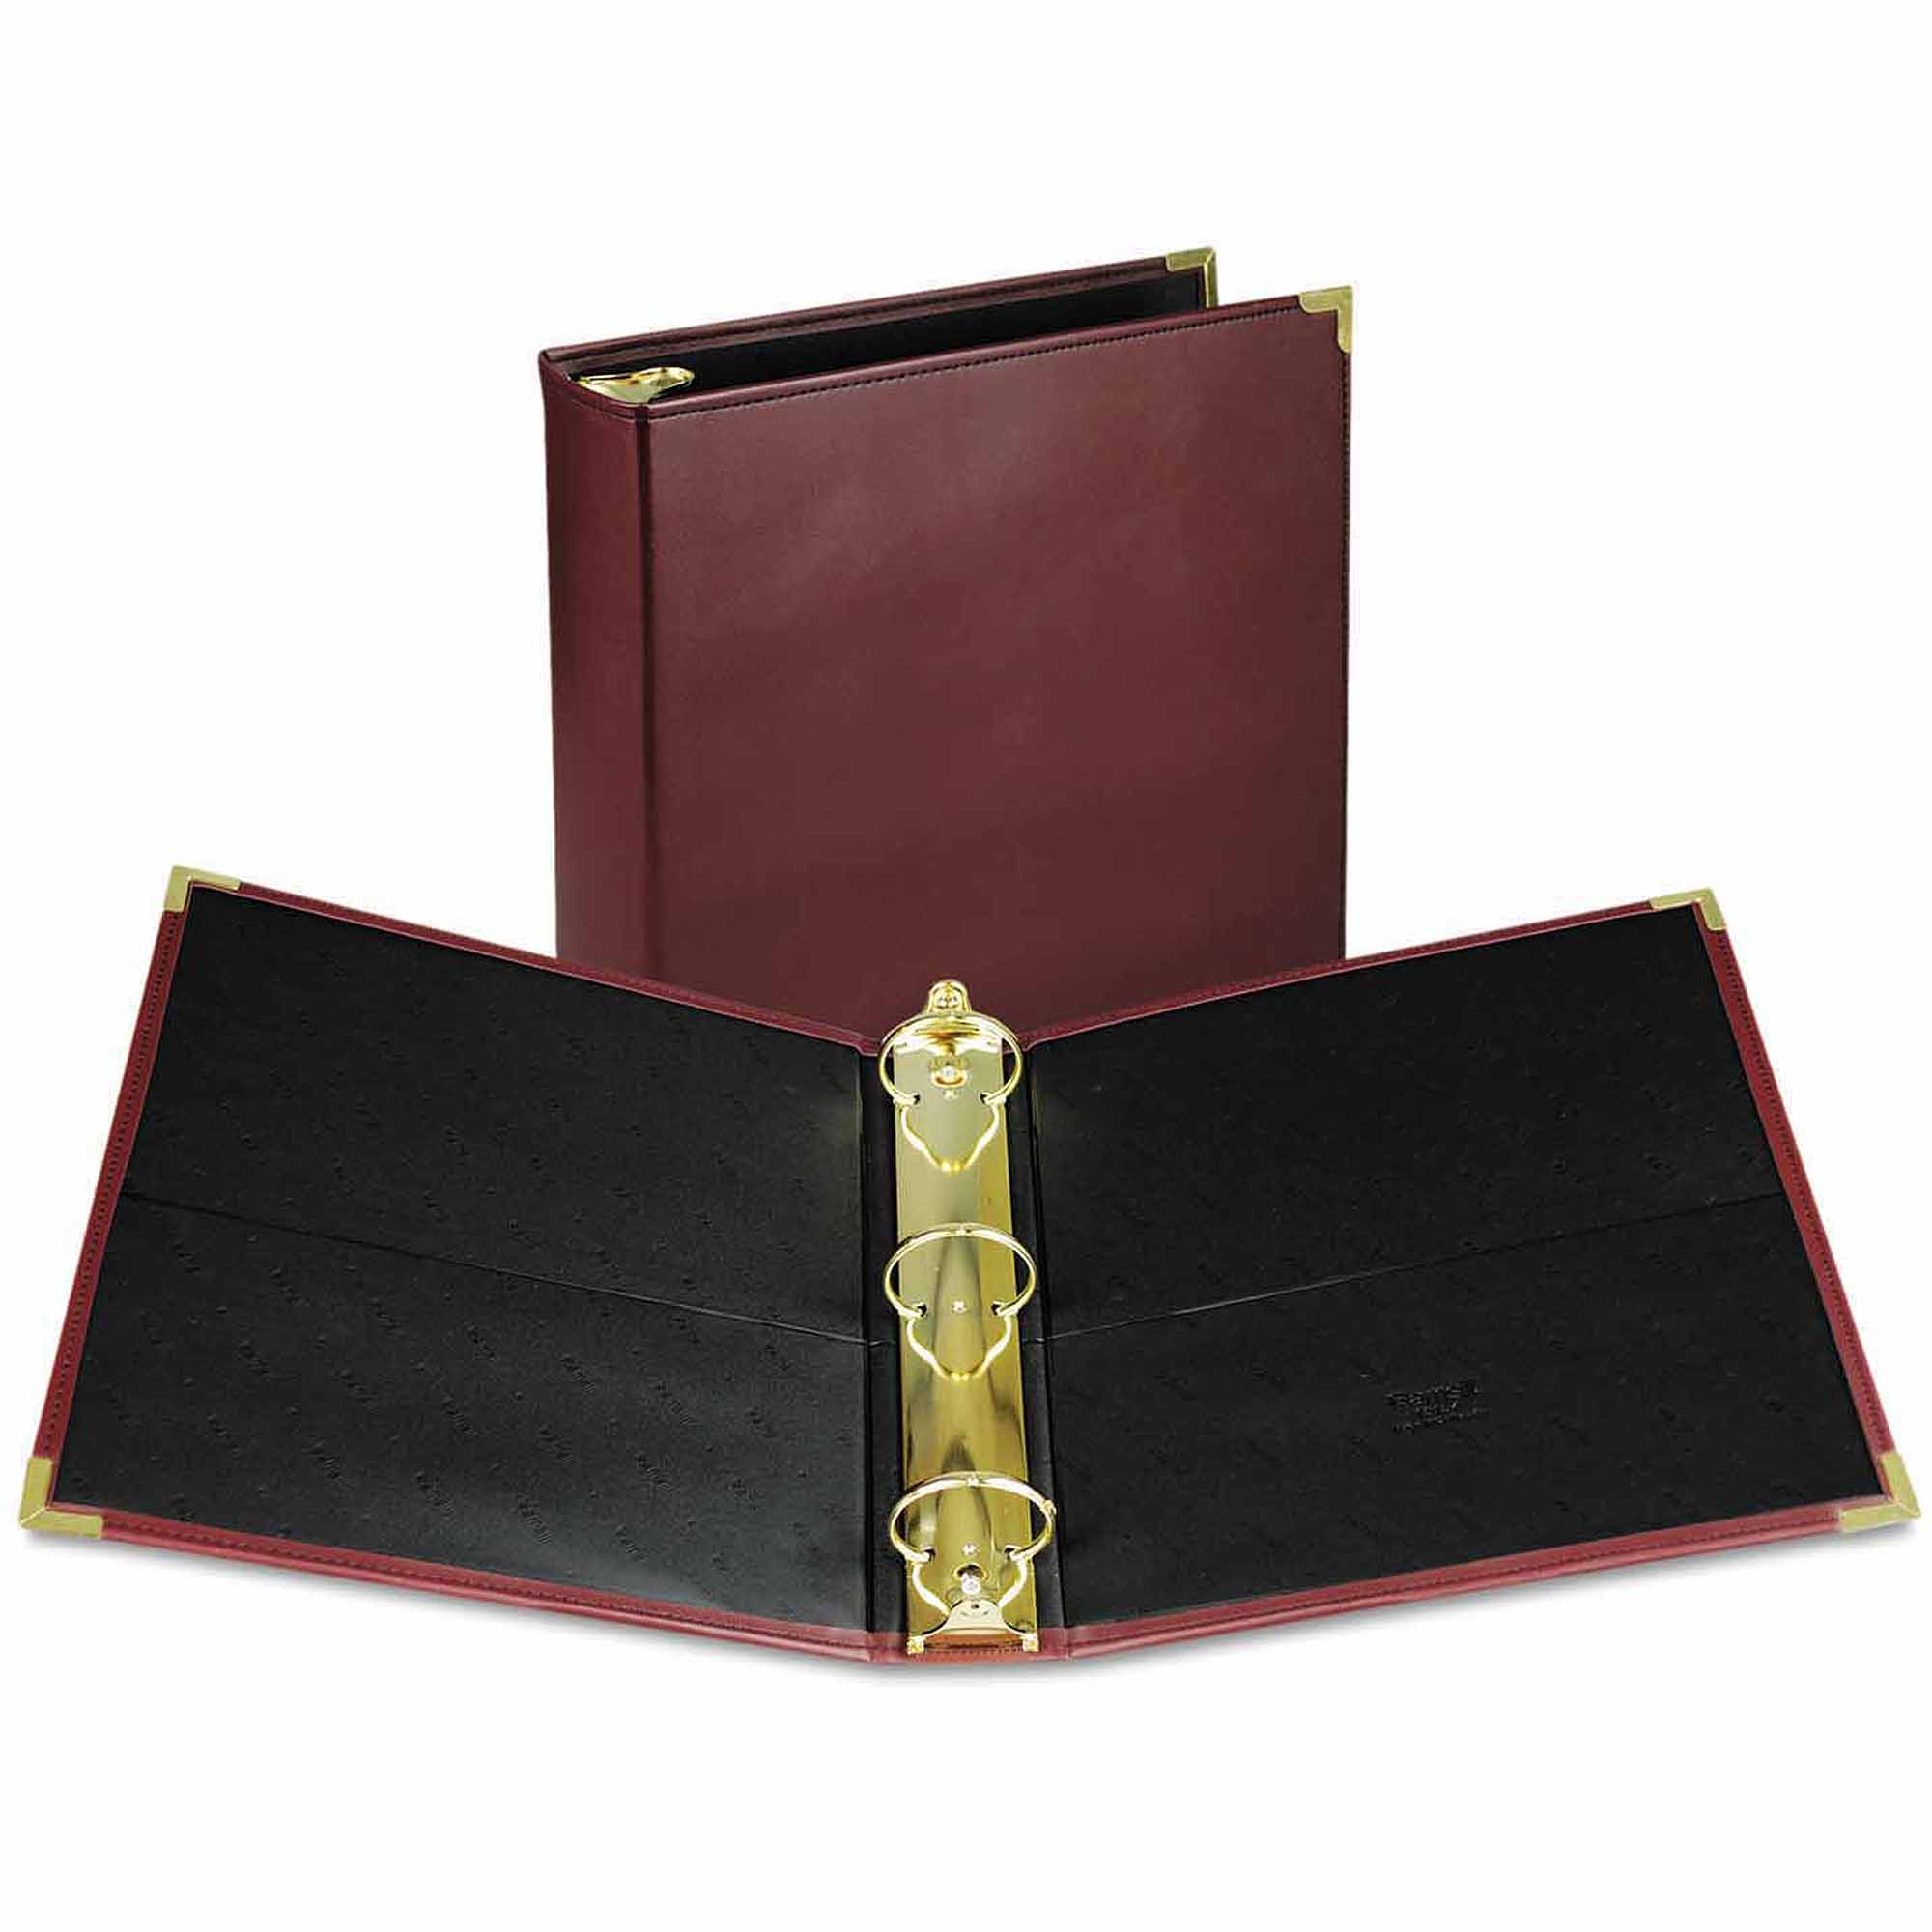 "Samsill Classic Collection Ring Binder Portfolio, 11 x 8 1/2, 2"" Capacity, Burgundy"